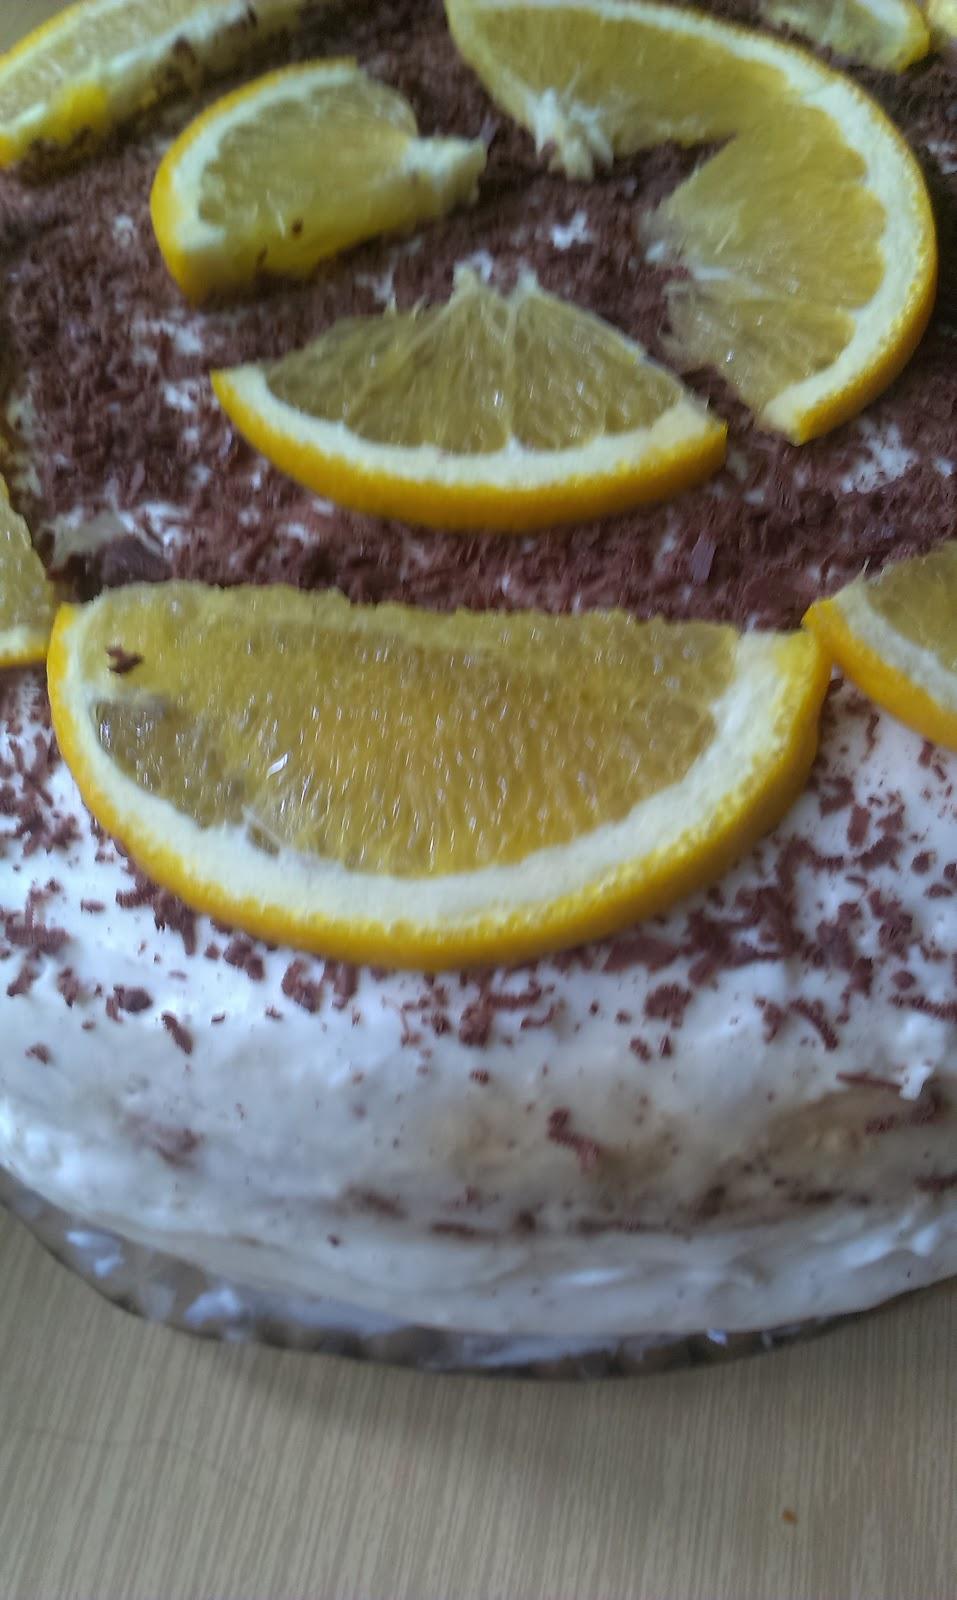 tort, ciasto, przepis na tort, kubus, nadzienie z soku, ciasto dla dzieci, przepis na tort, latwy przepis na tort, blog kulinarny, blogujaca mama dwojki